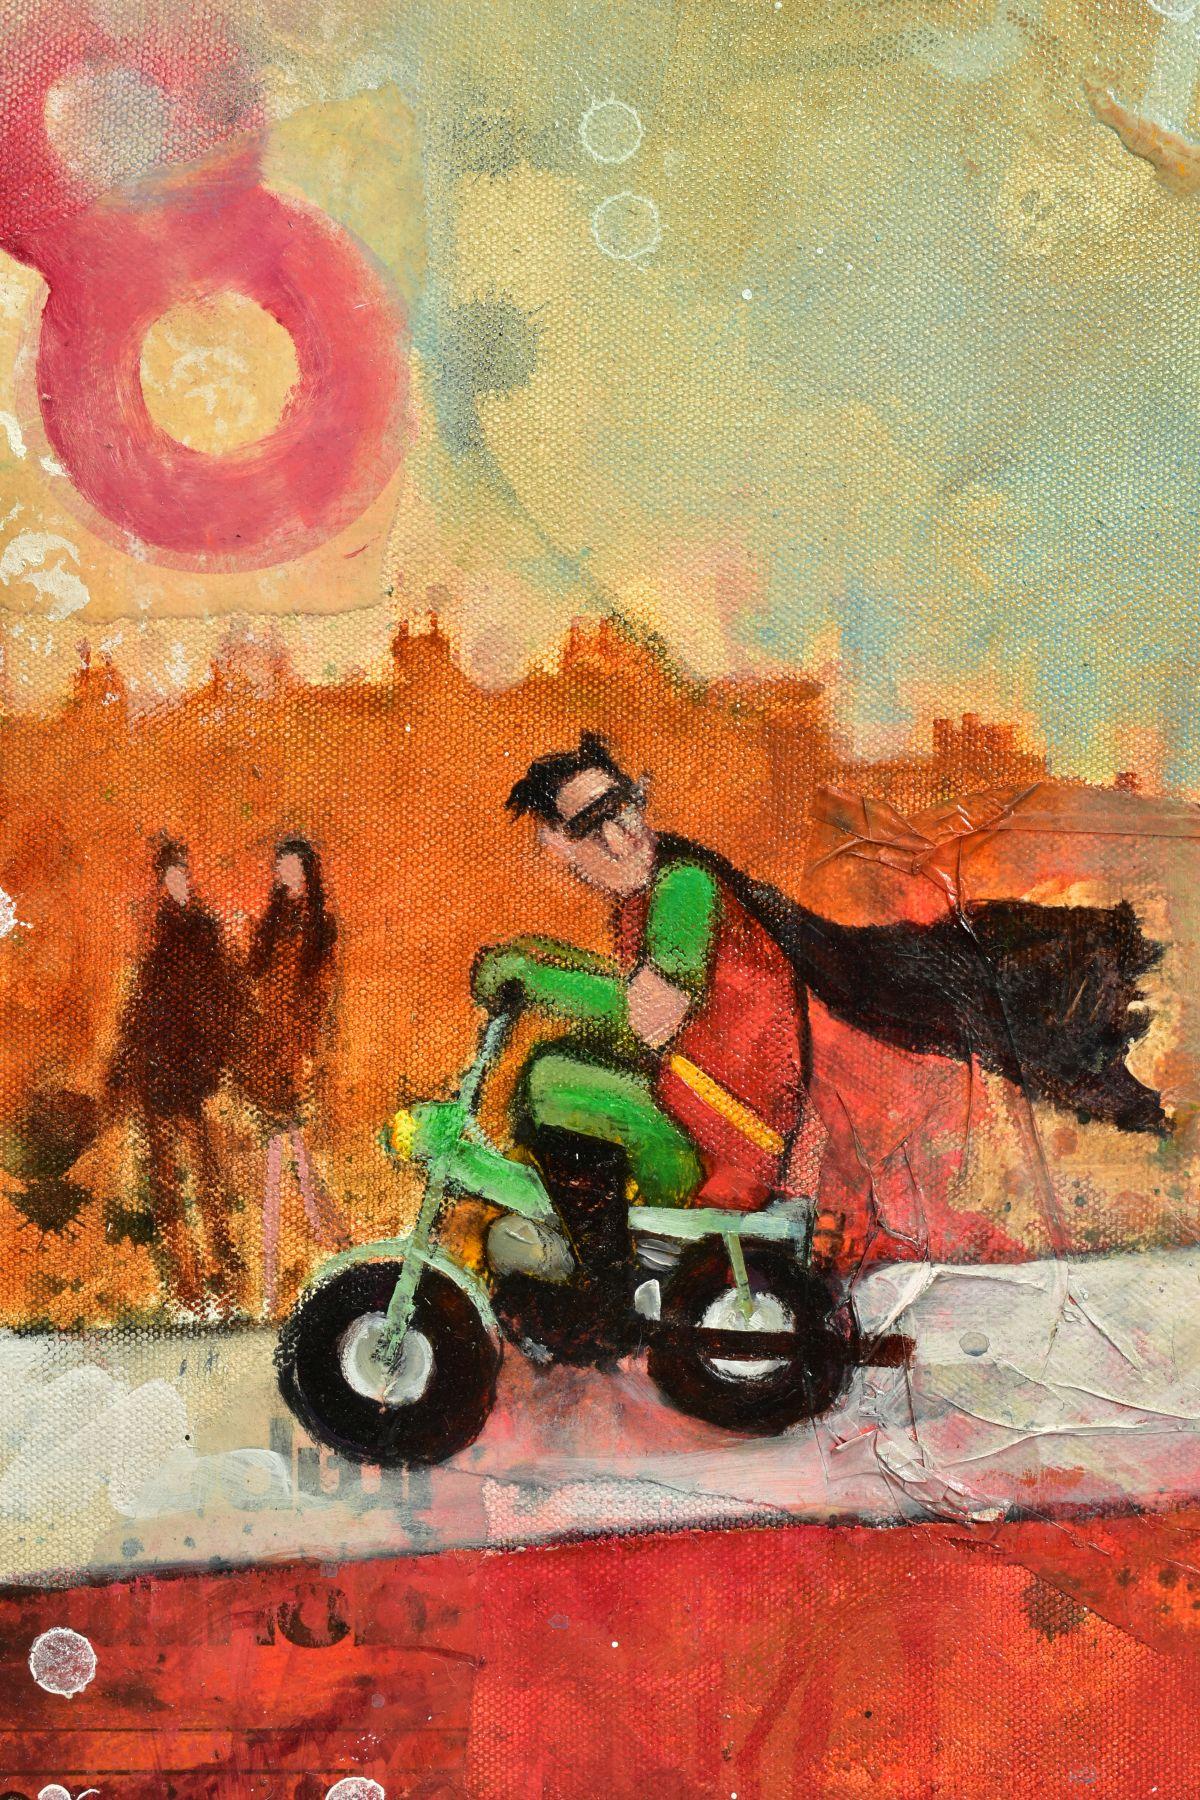 RICHARD BUREL (FRANCE 1974), 'Batman & Robin', the comic super heroes riding mopeds, signed bottom - Image 3 of 6